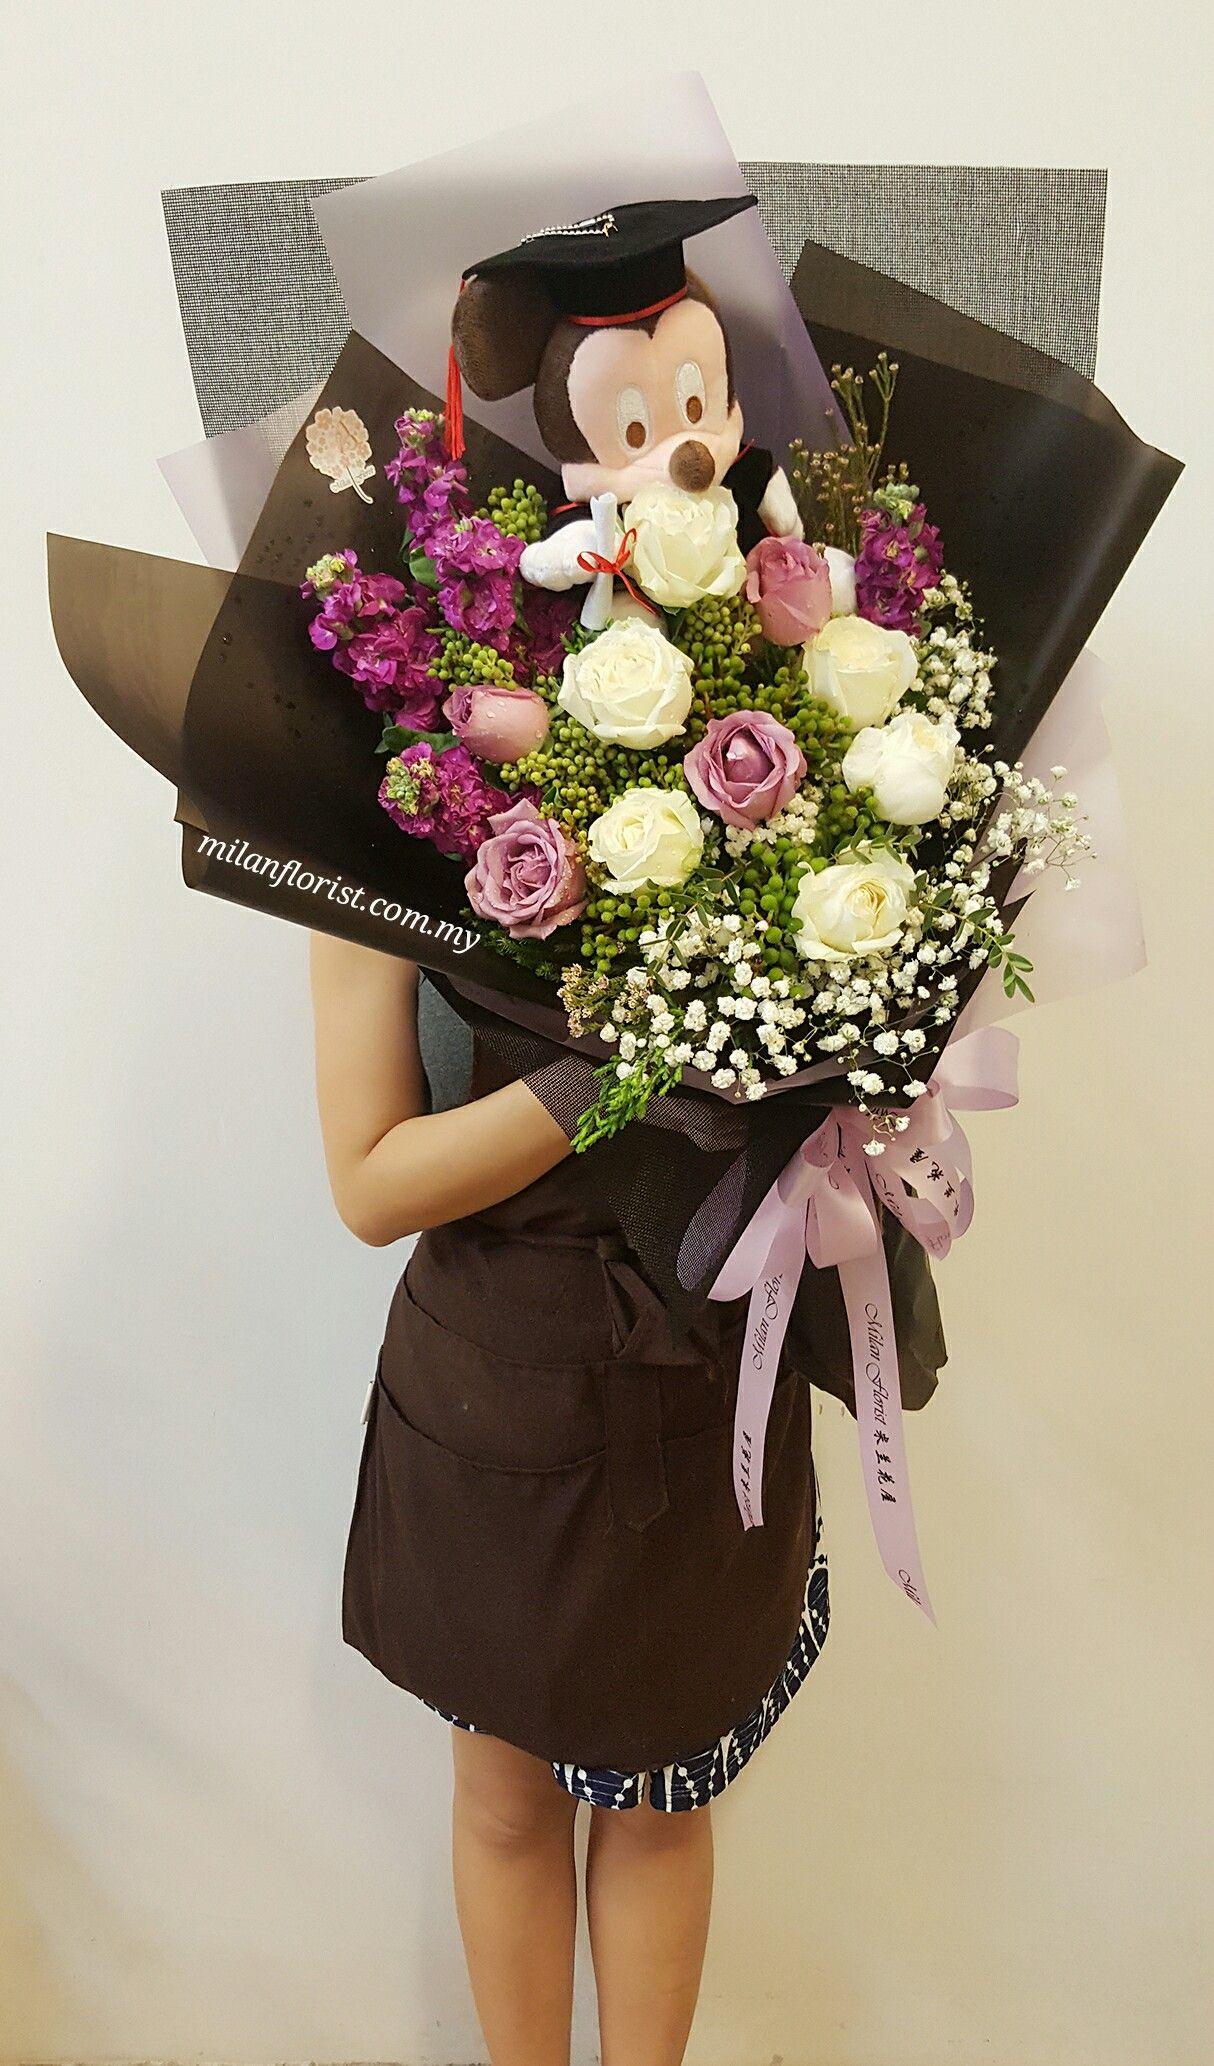 Convocation Graduation Micky Milanstyle Milanflorist Mfma DZ³å…°èŠ±å±‹ DZ³å…°èŠ±å±‹ Milan Floris Graduation Flower Bouquet Graduation Flowers Bouquet Graduation Bouquet